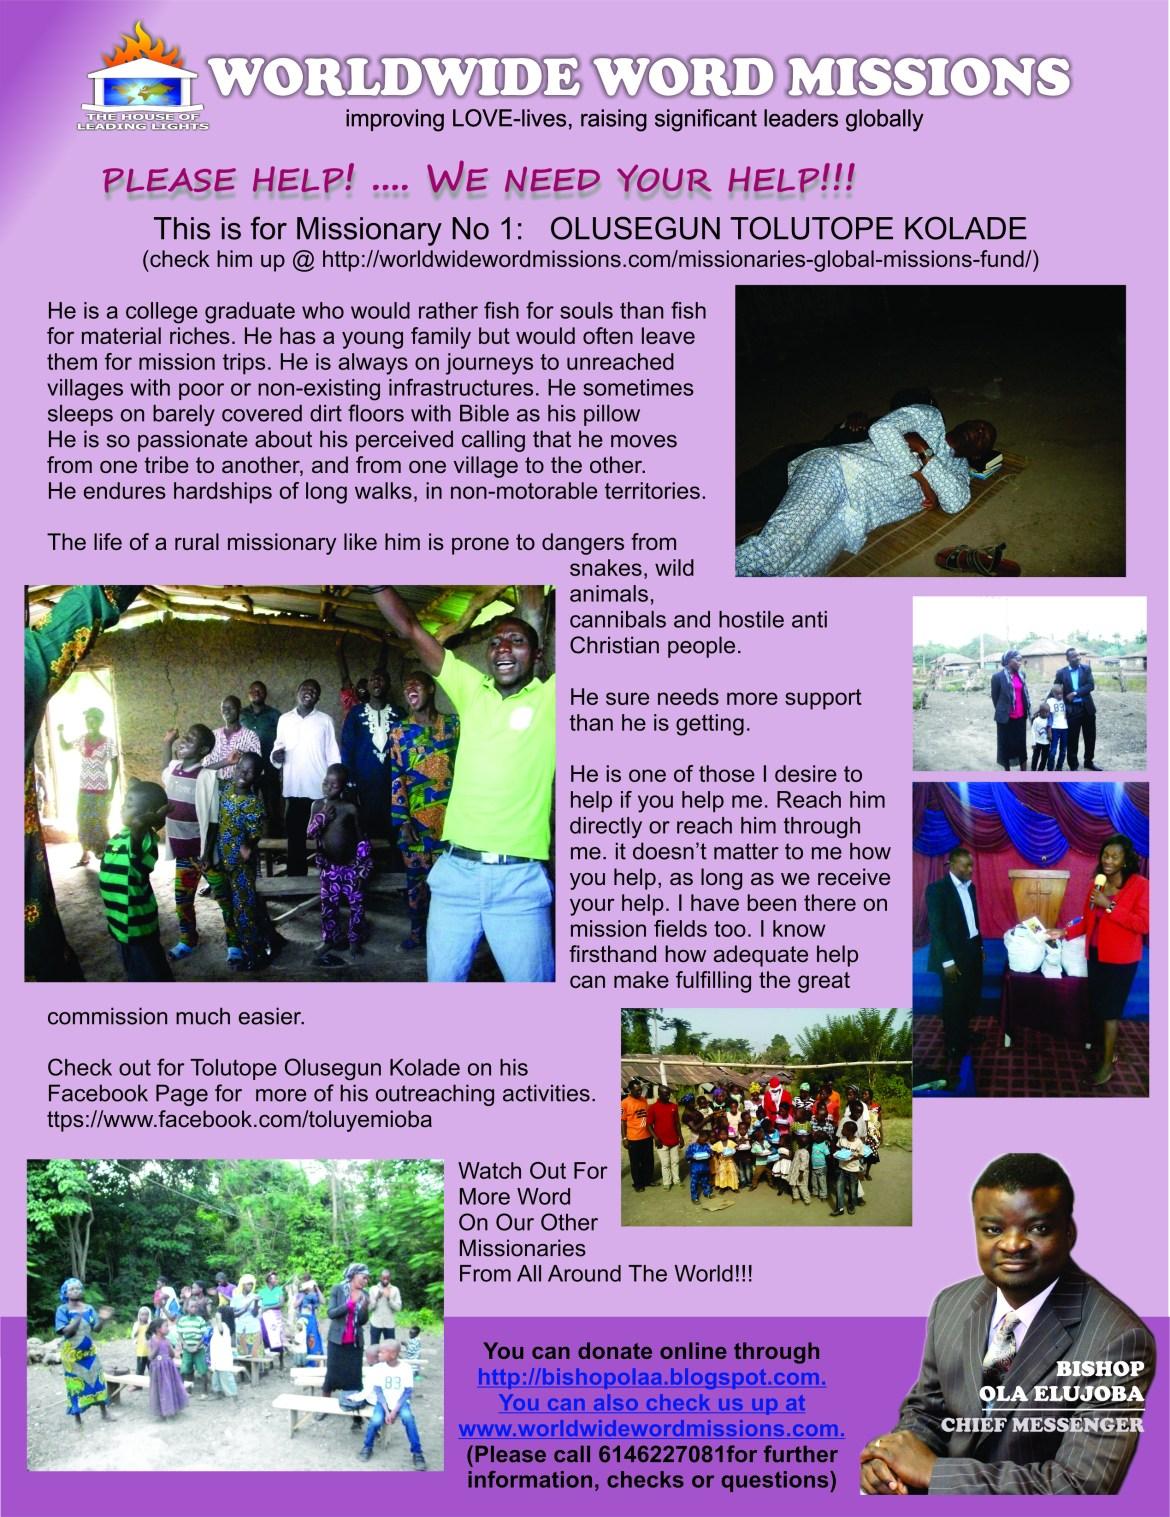 wwwmissions help flier - olusegun kolade